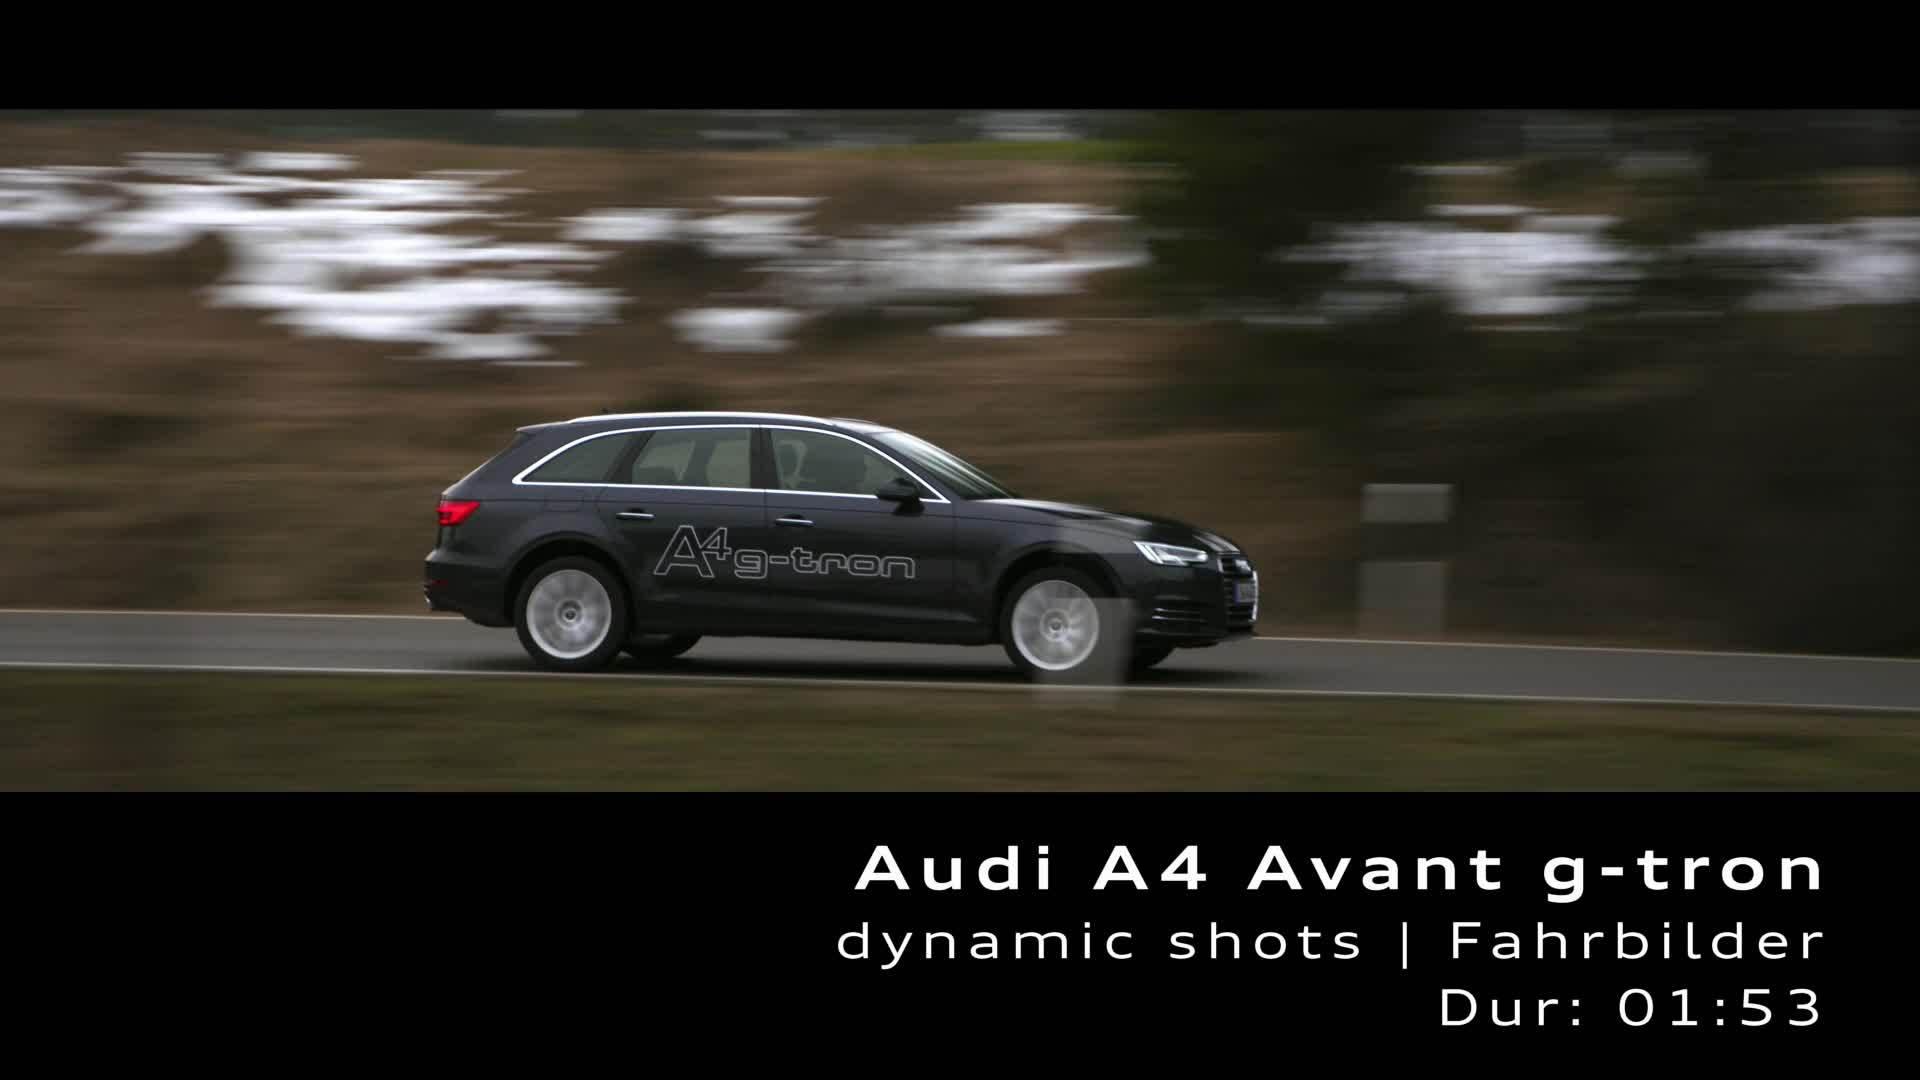 Audi A4 Avant g-tron (2017) – Footage